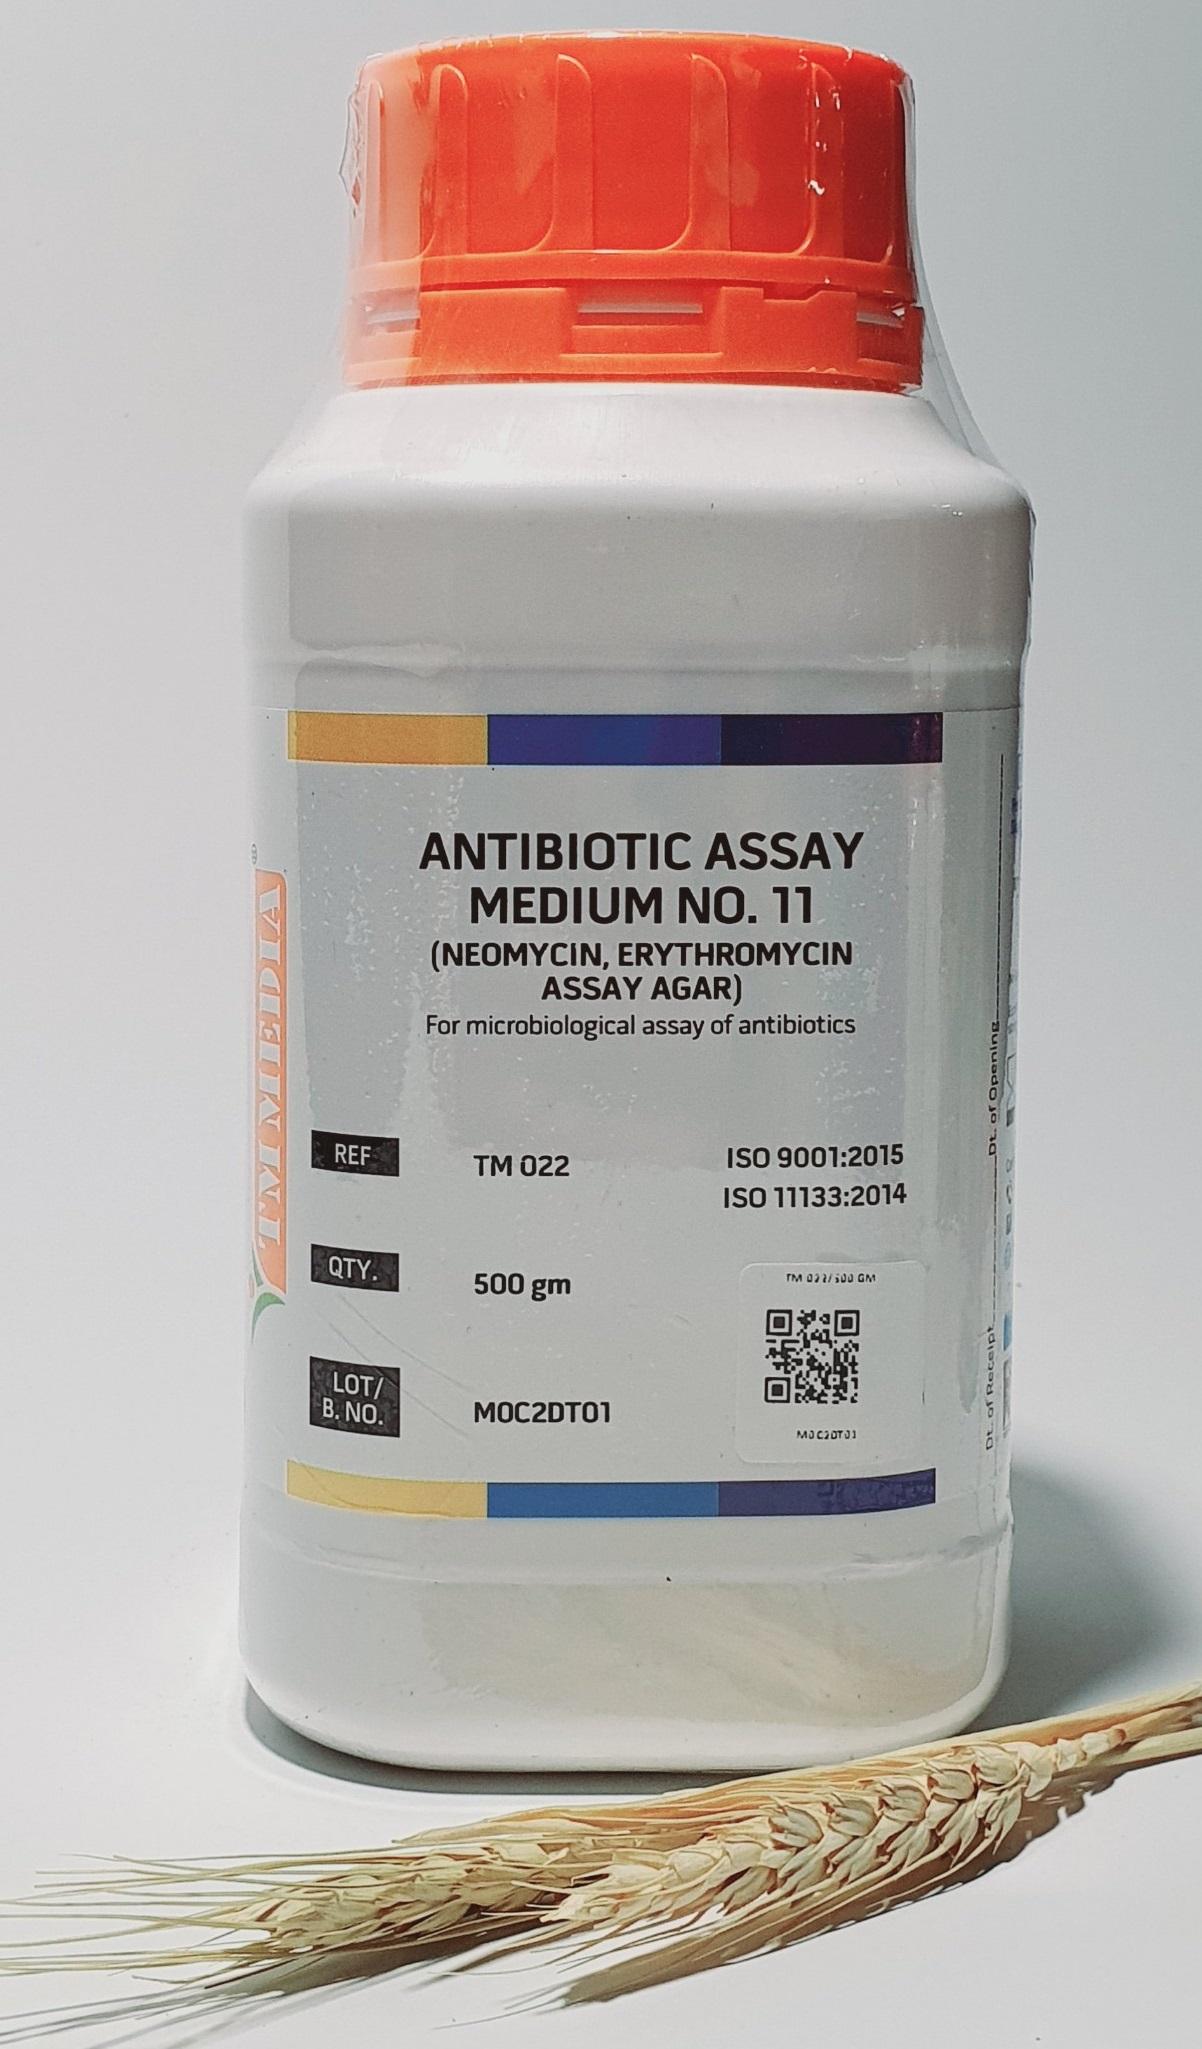 Antibiotic Assay Medium No.11 Neomycin, Erythromycin Assay Agar Erythromycin Seed Agar